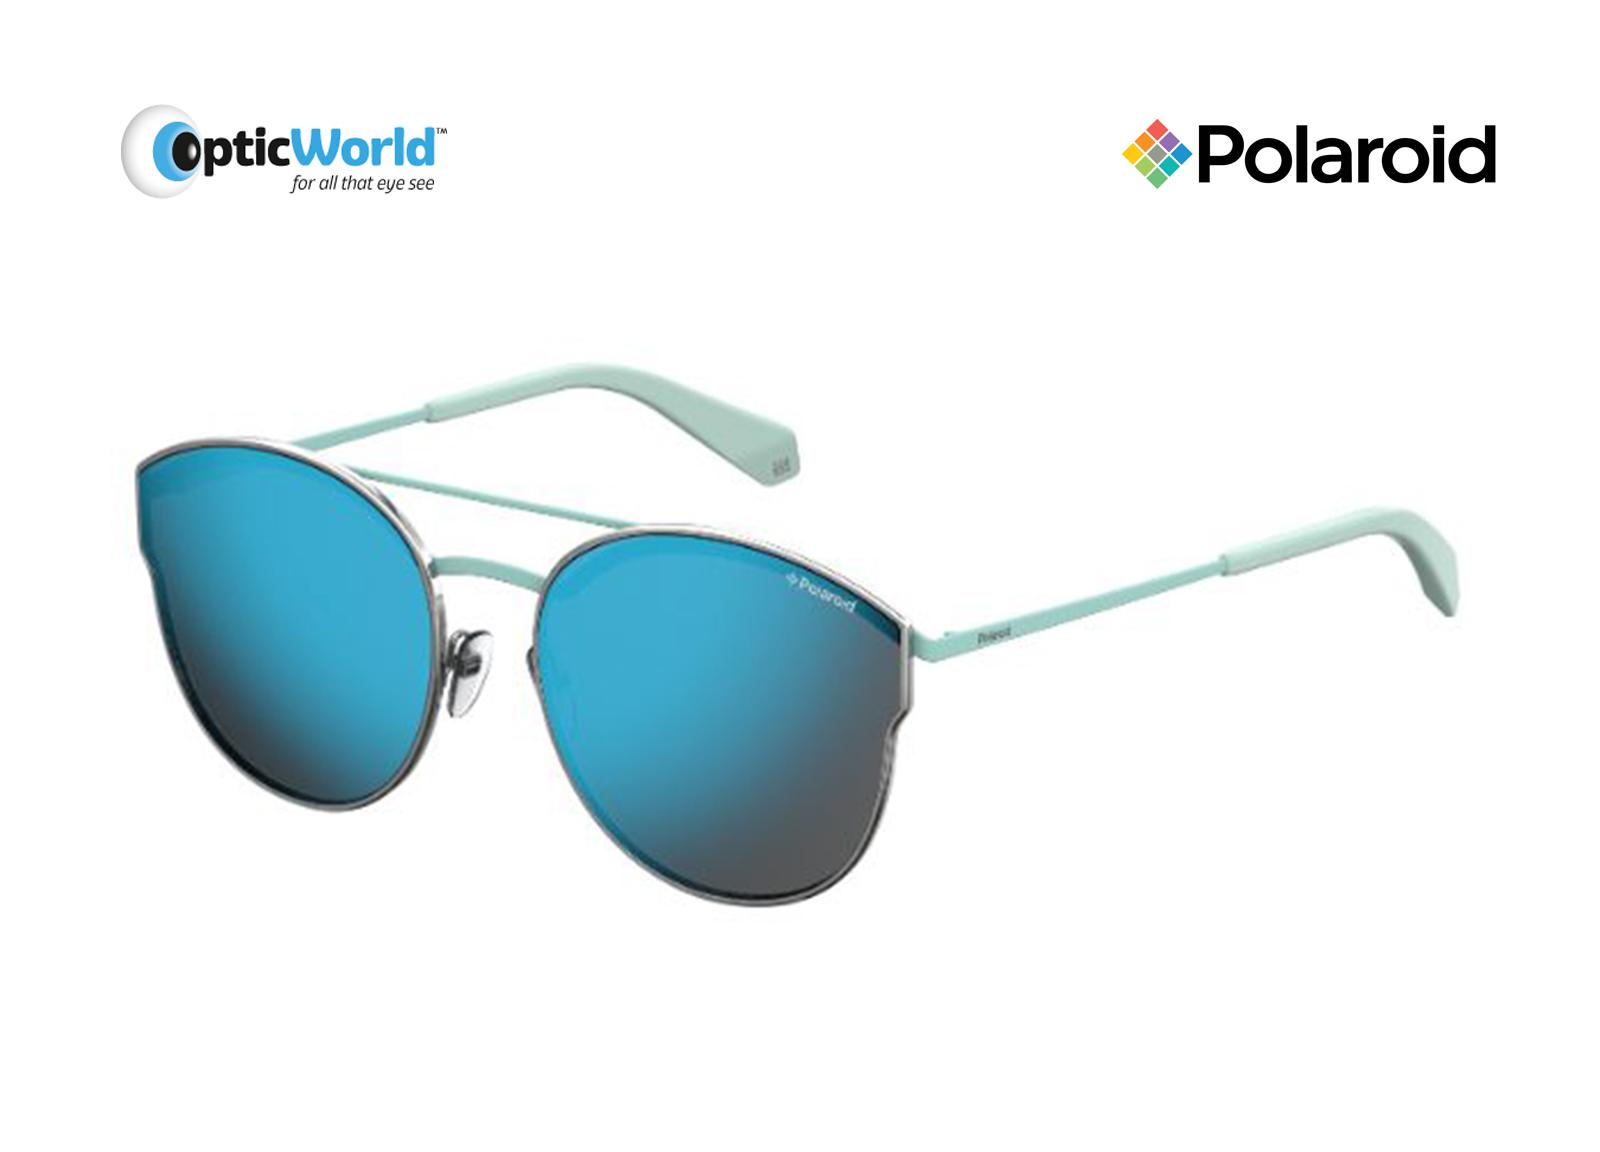 Sonnenbrille POLAROID polarized PLD4057/S 6LB 5X 60-18 Ruthenium Mirror bwMaNRxir